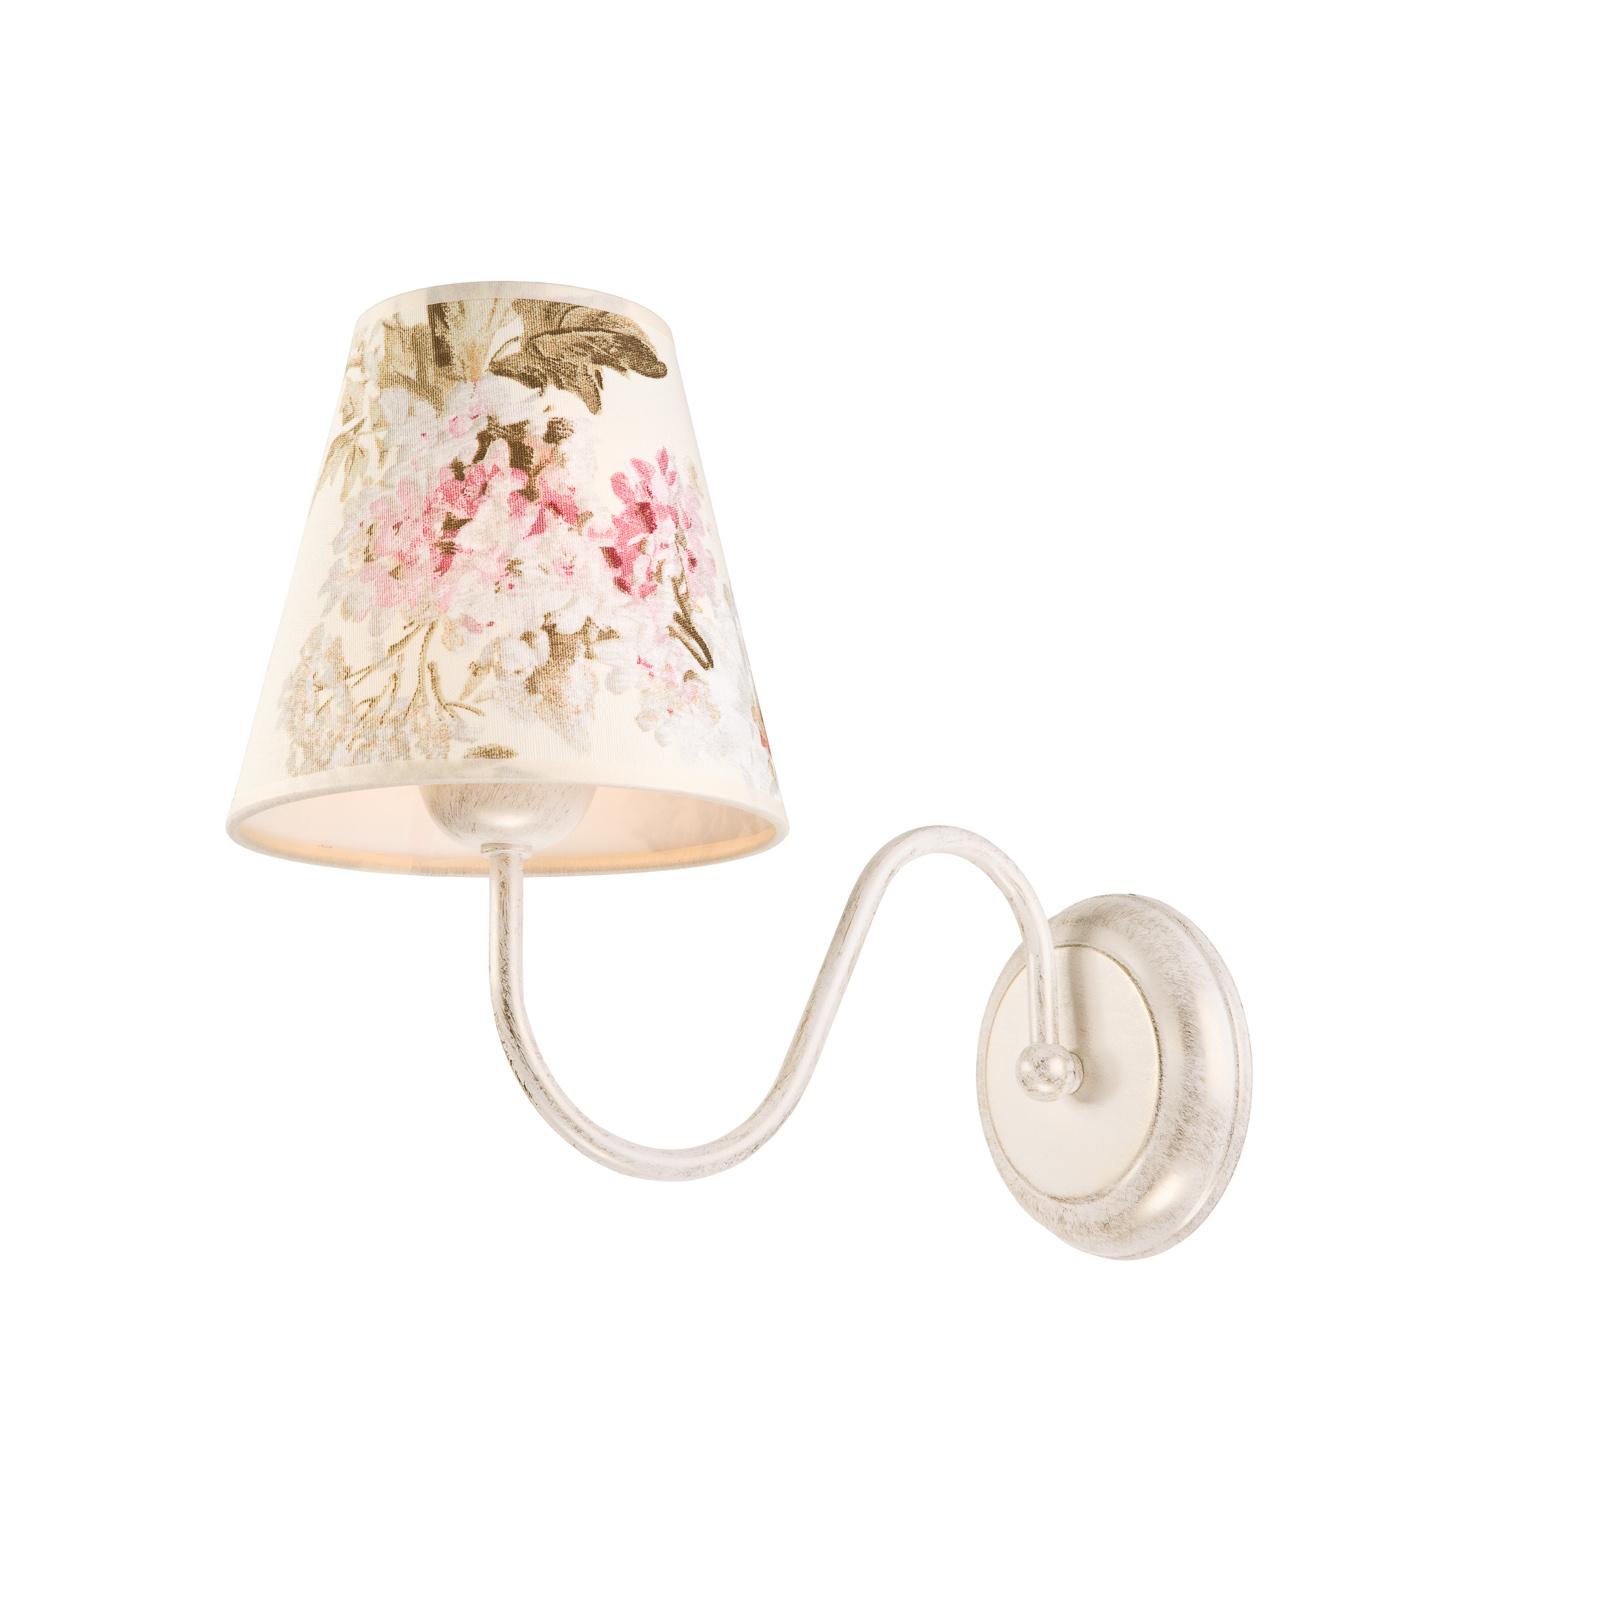 Lampa ścienna Sara, zadrukowany klosz z tkaniny